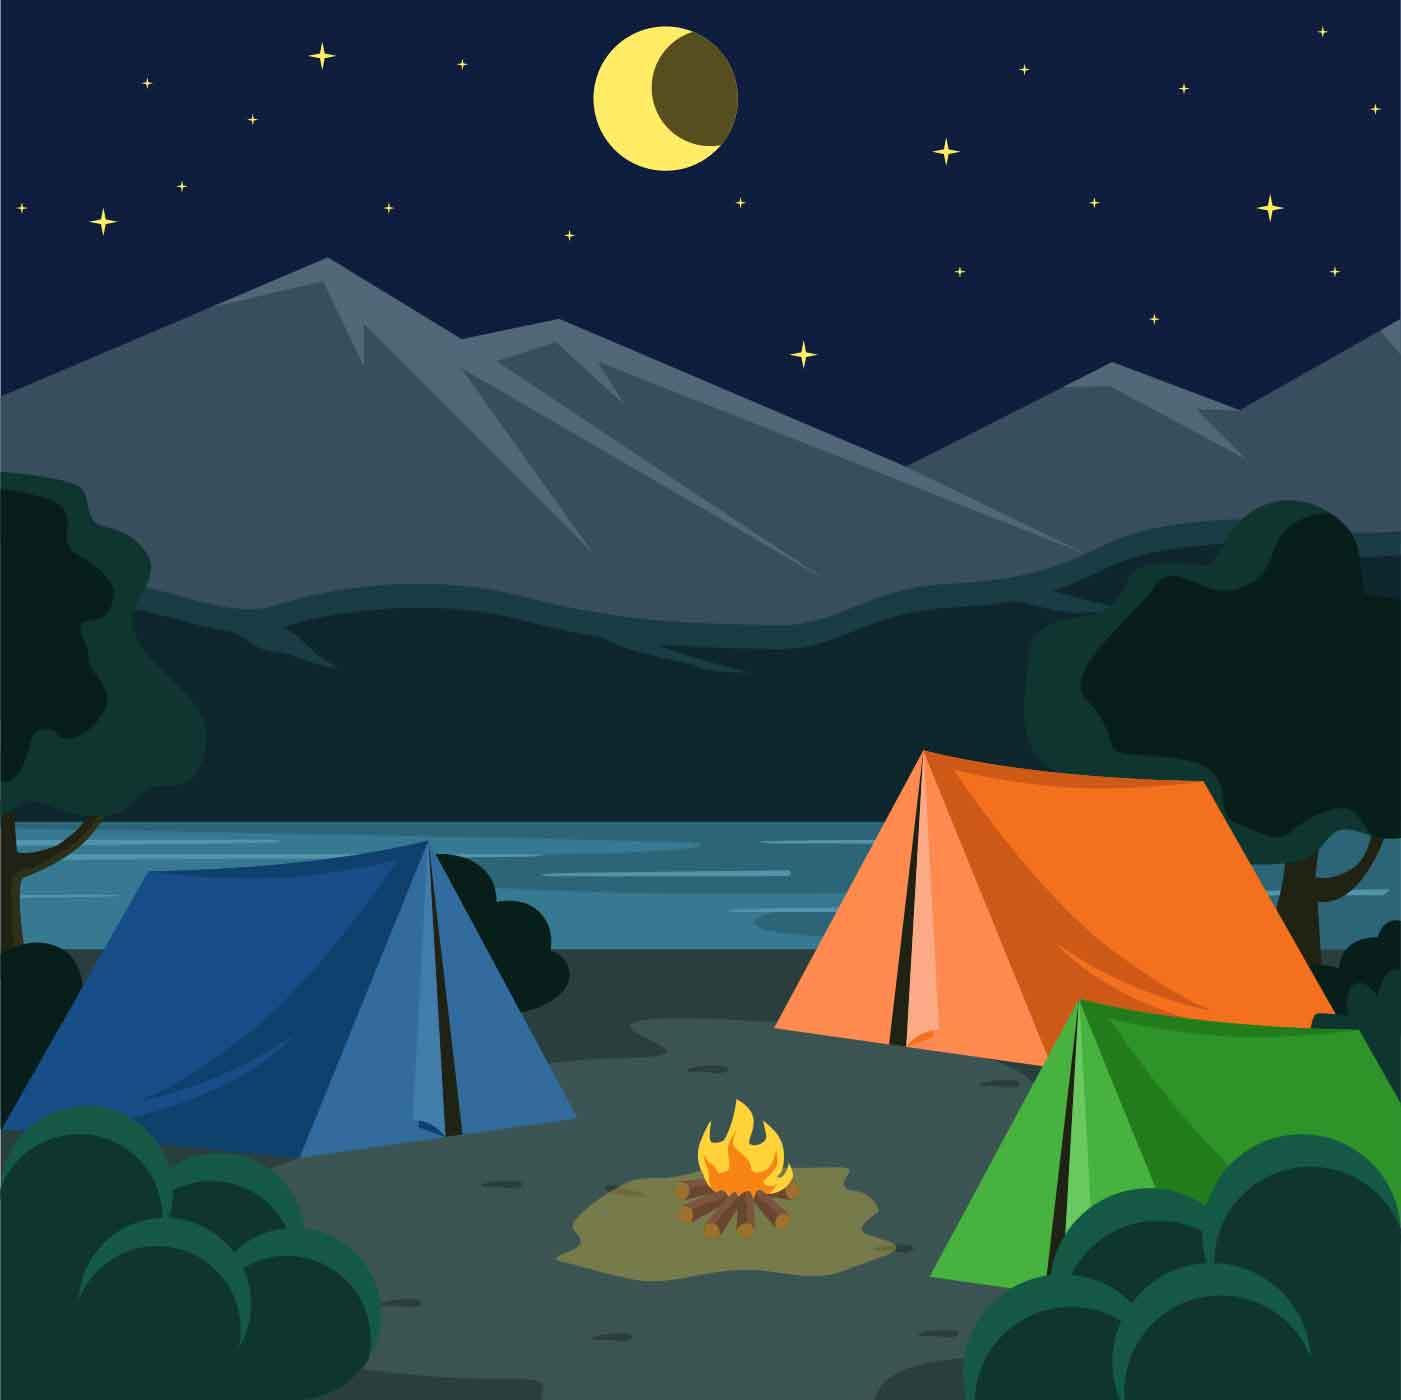 Night Camping Illustration Vector 209086 - Download Free ...